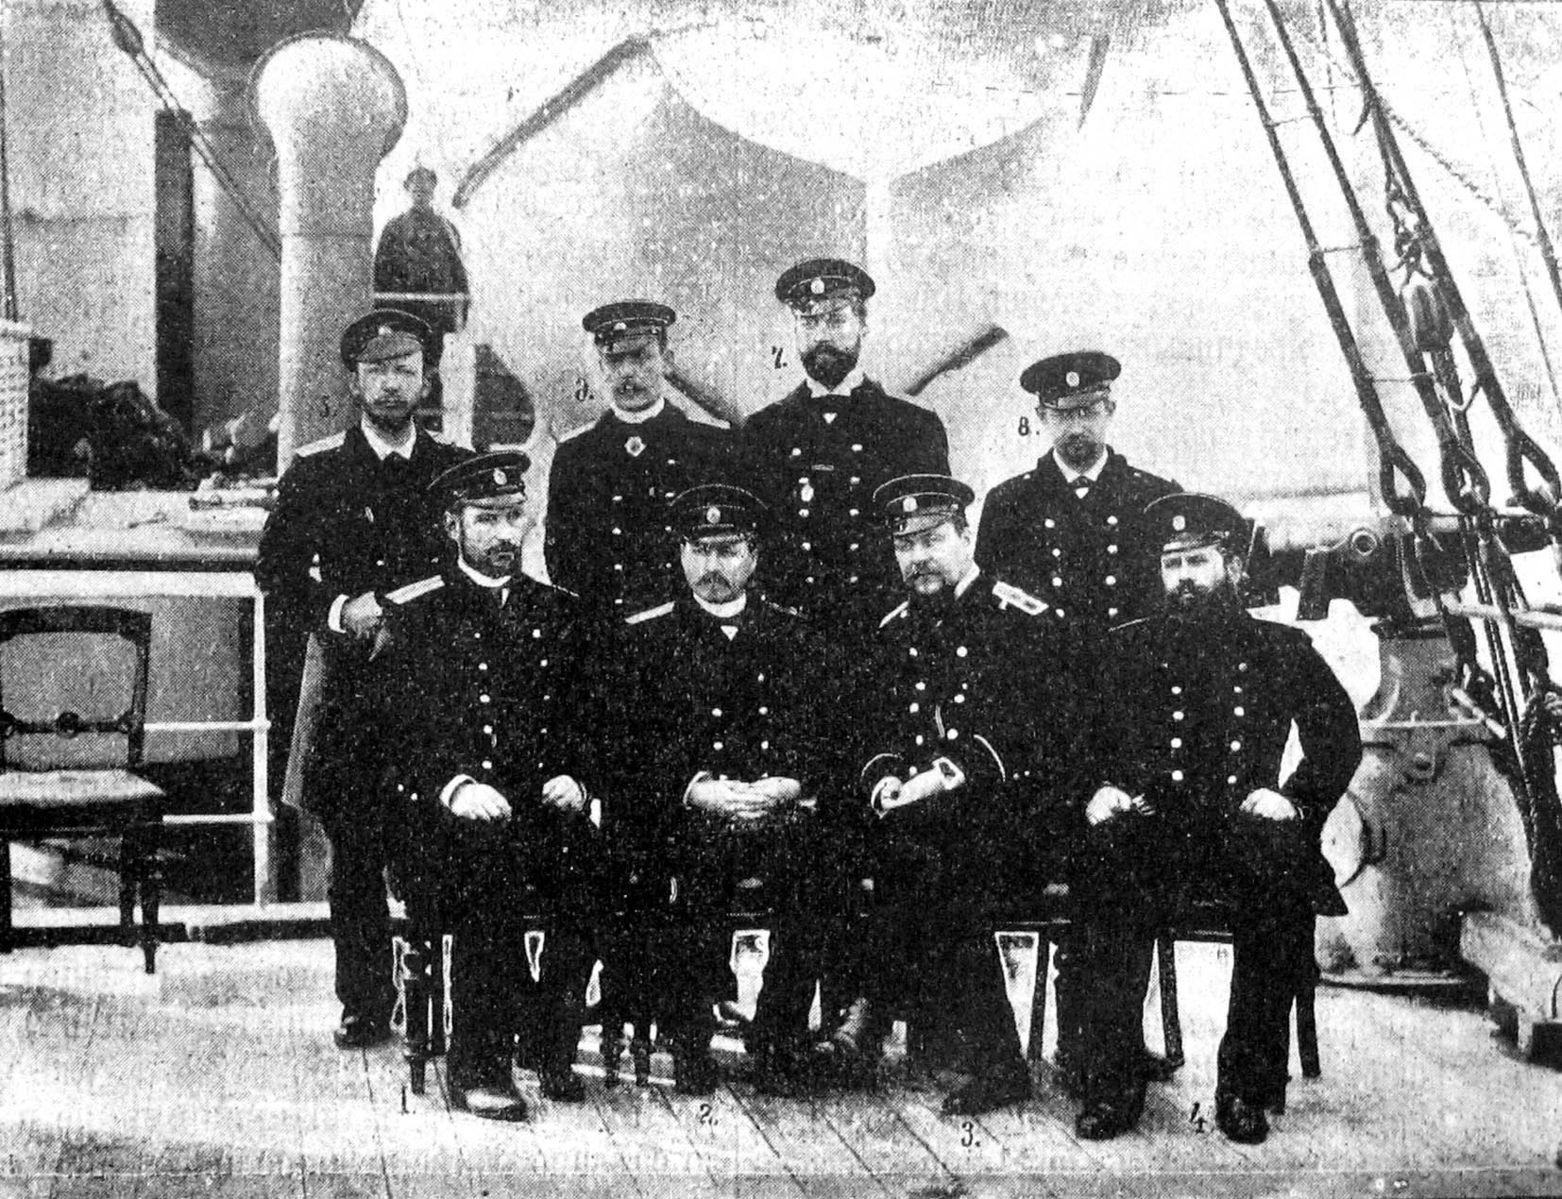 фото морских офицеров до революции сравнении другими марками